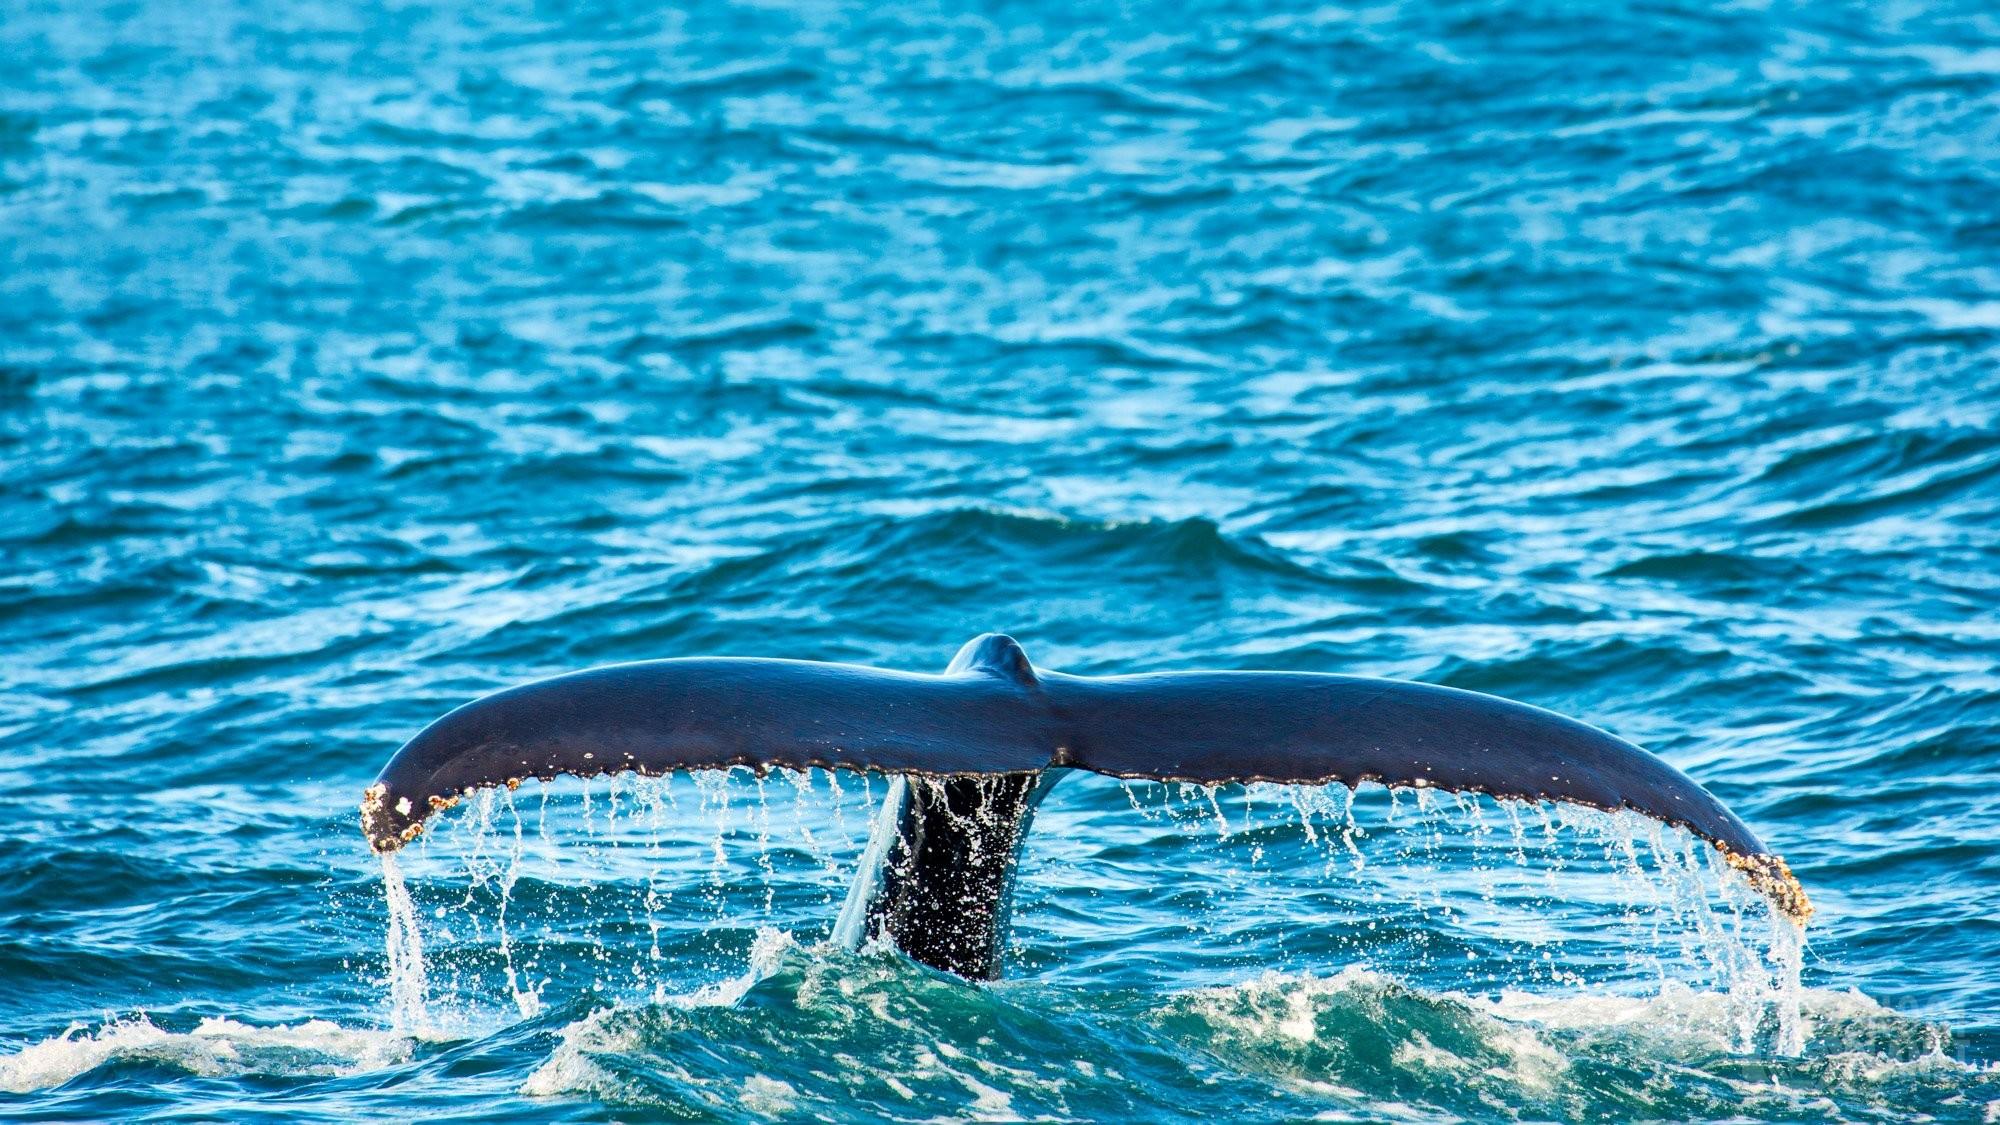 Humpback whale tail in Skjalfandi Bay, Iceland